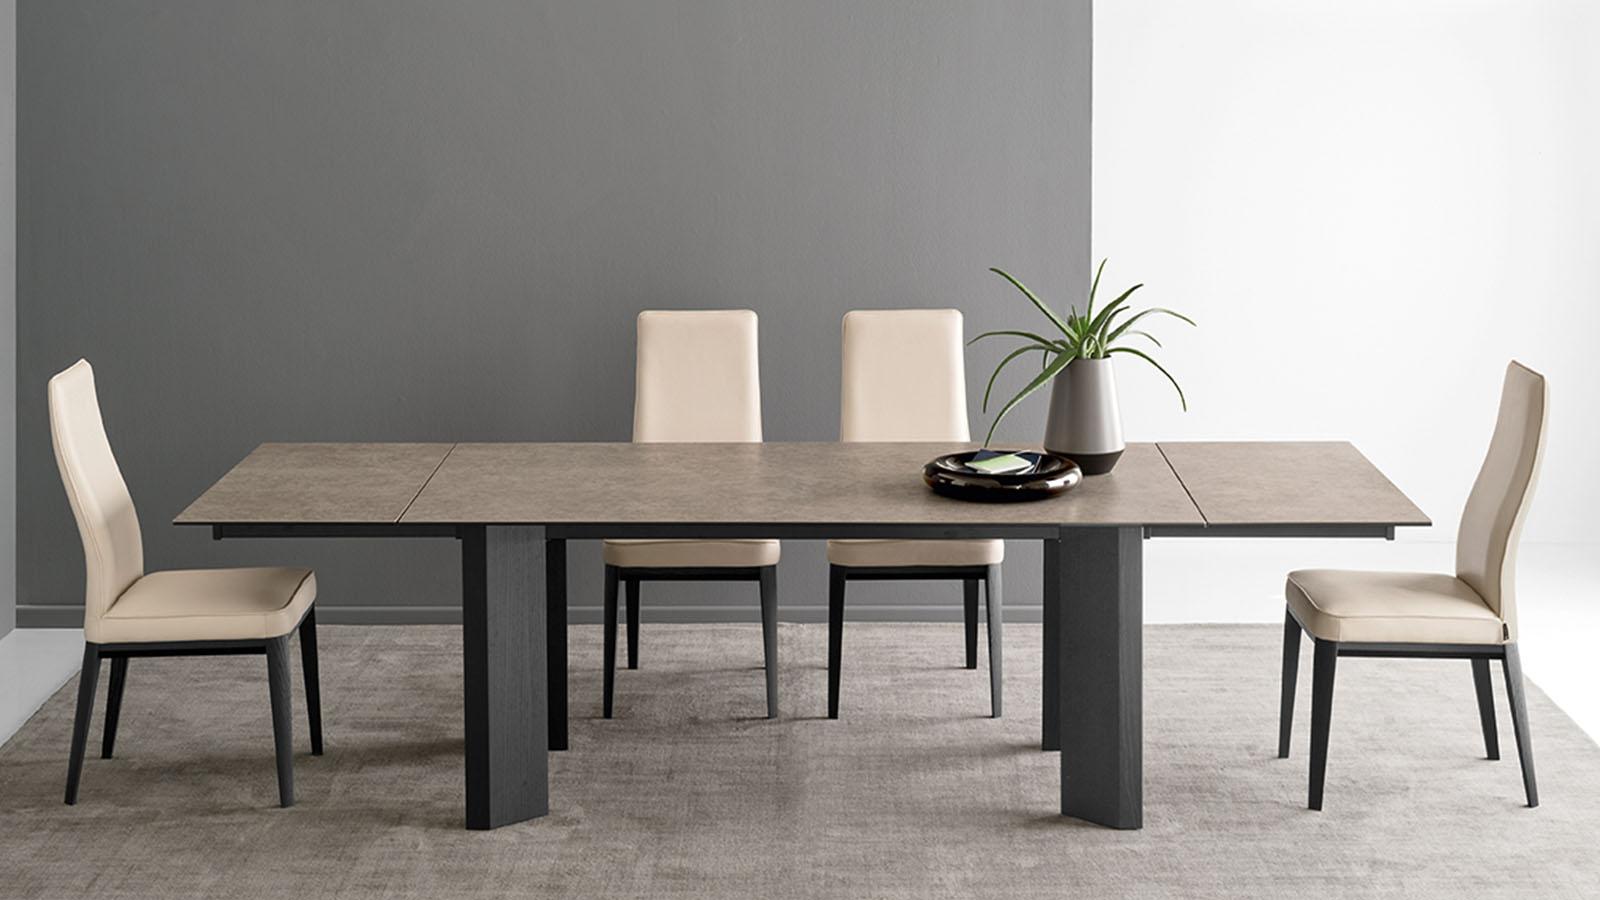 margot chaise calligaris cs 1861 lh mariette clermont. Black Bedroom Furniture Sets. Home Design Ideas